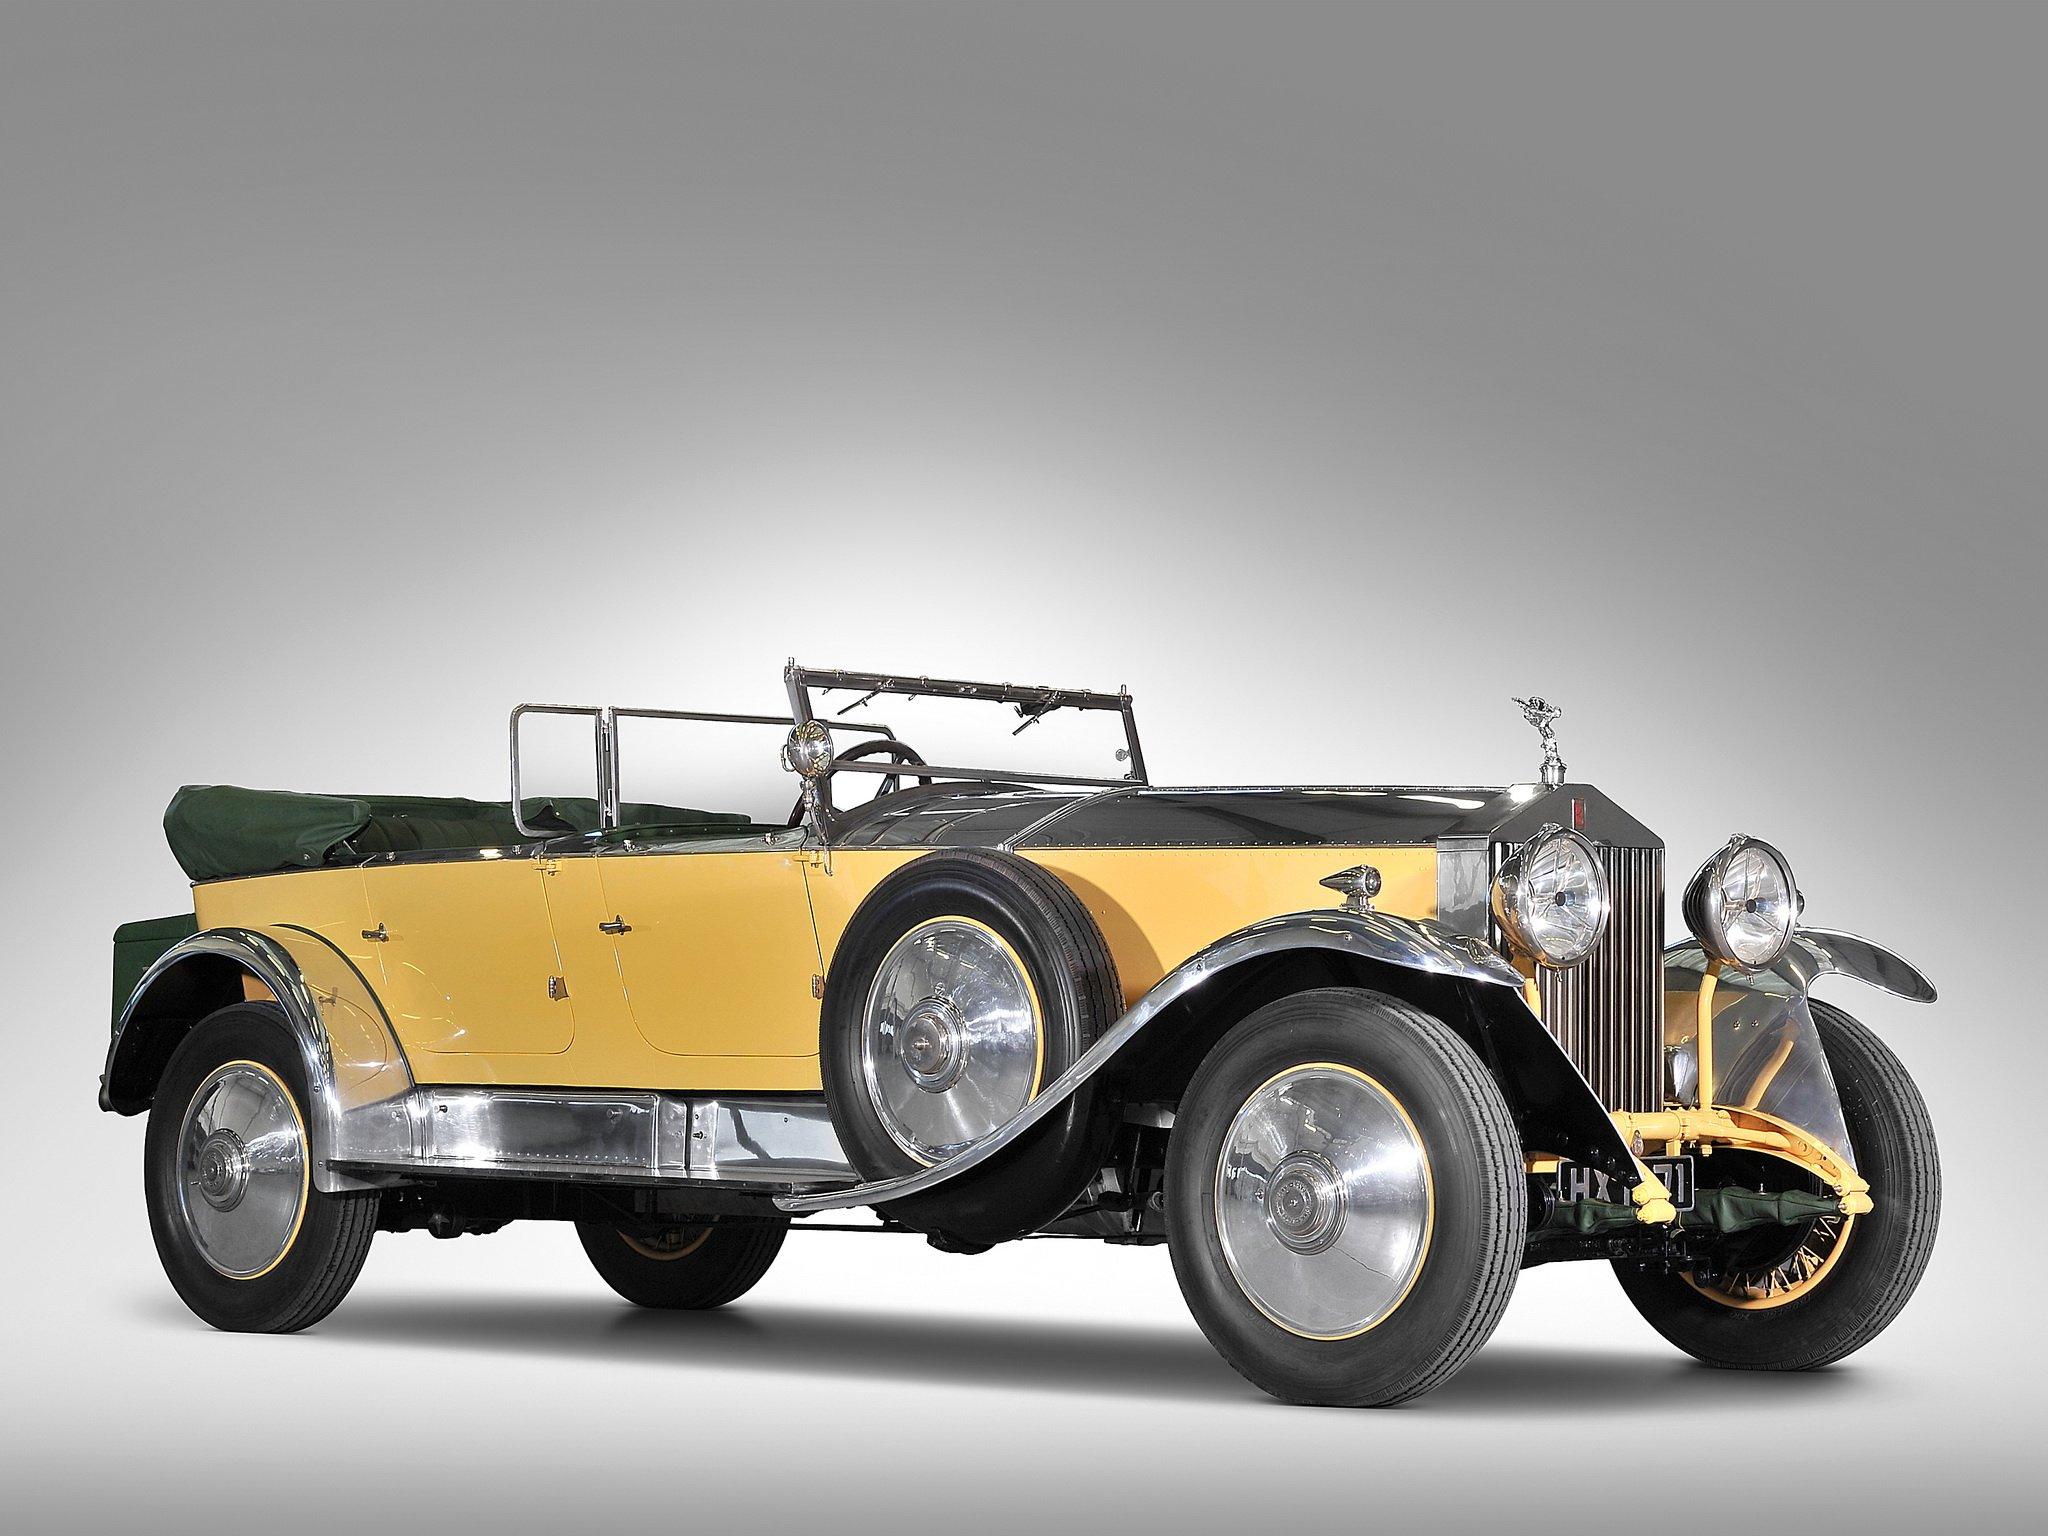 1929 Rolls Royce Phantom I Tourer Barker retro convertible luxury